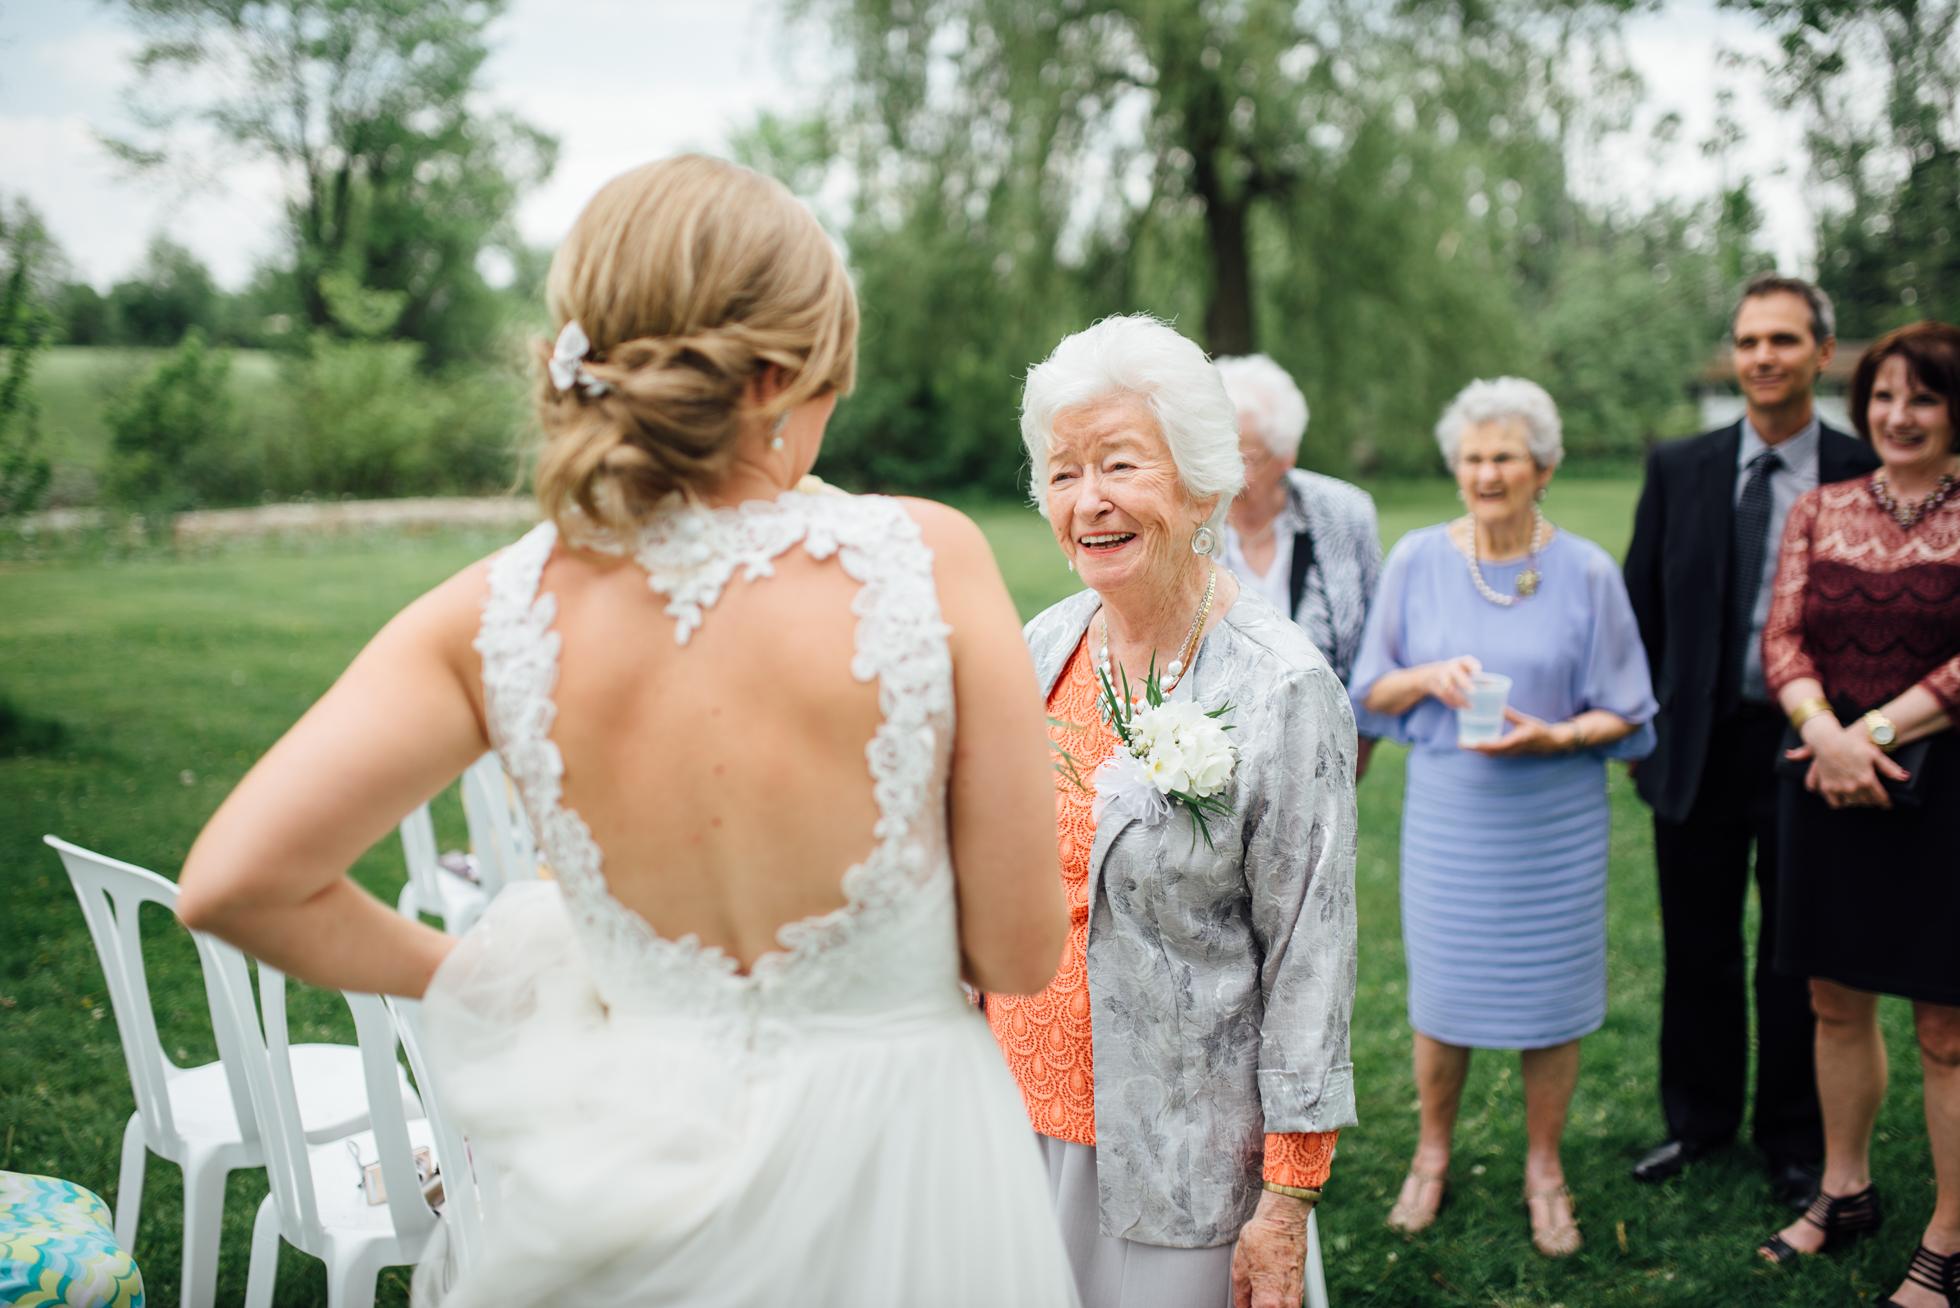 Outdoor-Caledon-Tralee-Wedding-Photography-69